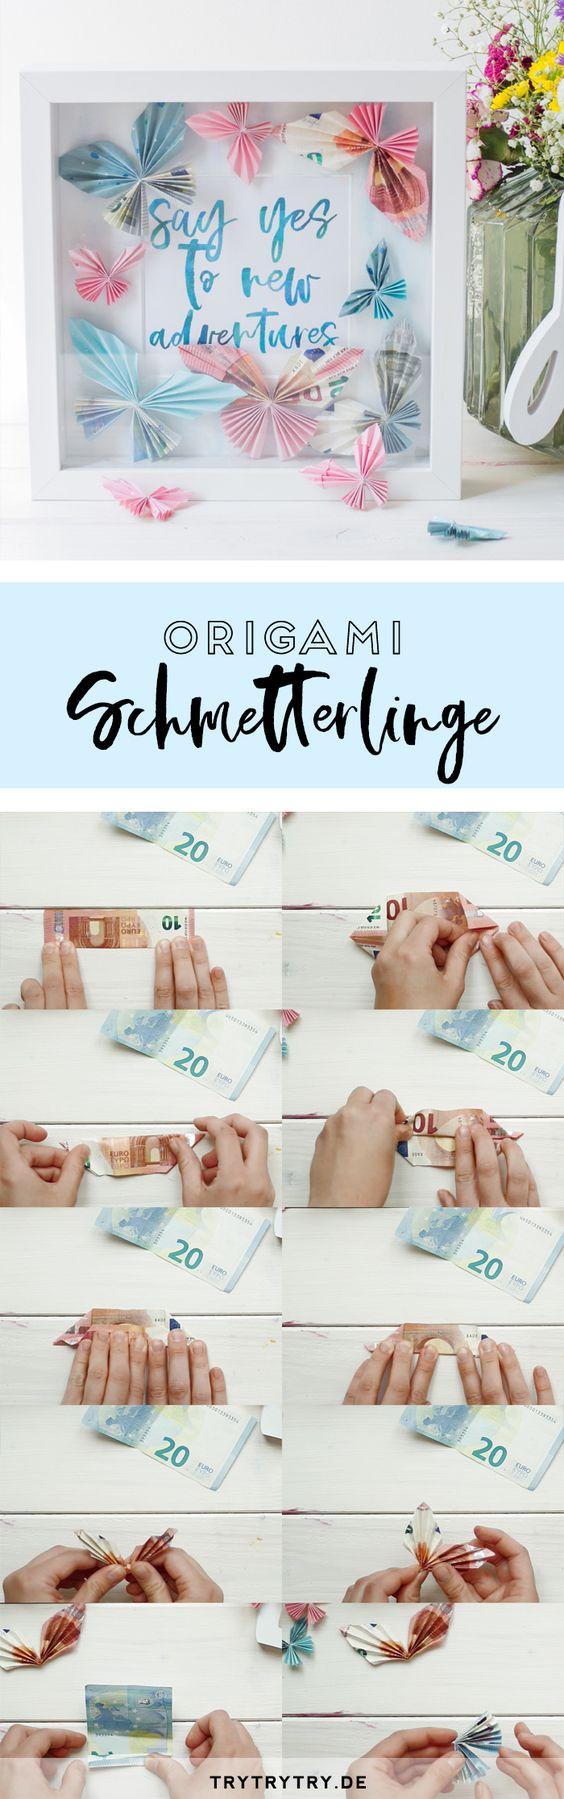 Origami Schmetterlinge als Geldgeschenk im Bilderrahmen